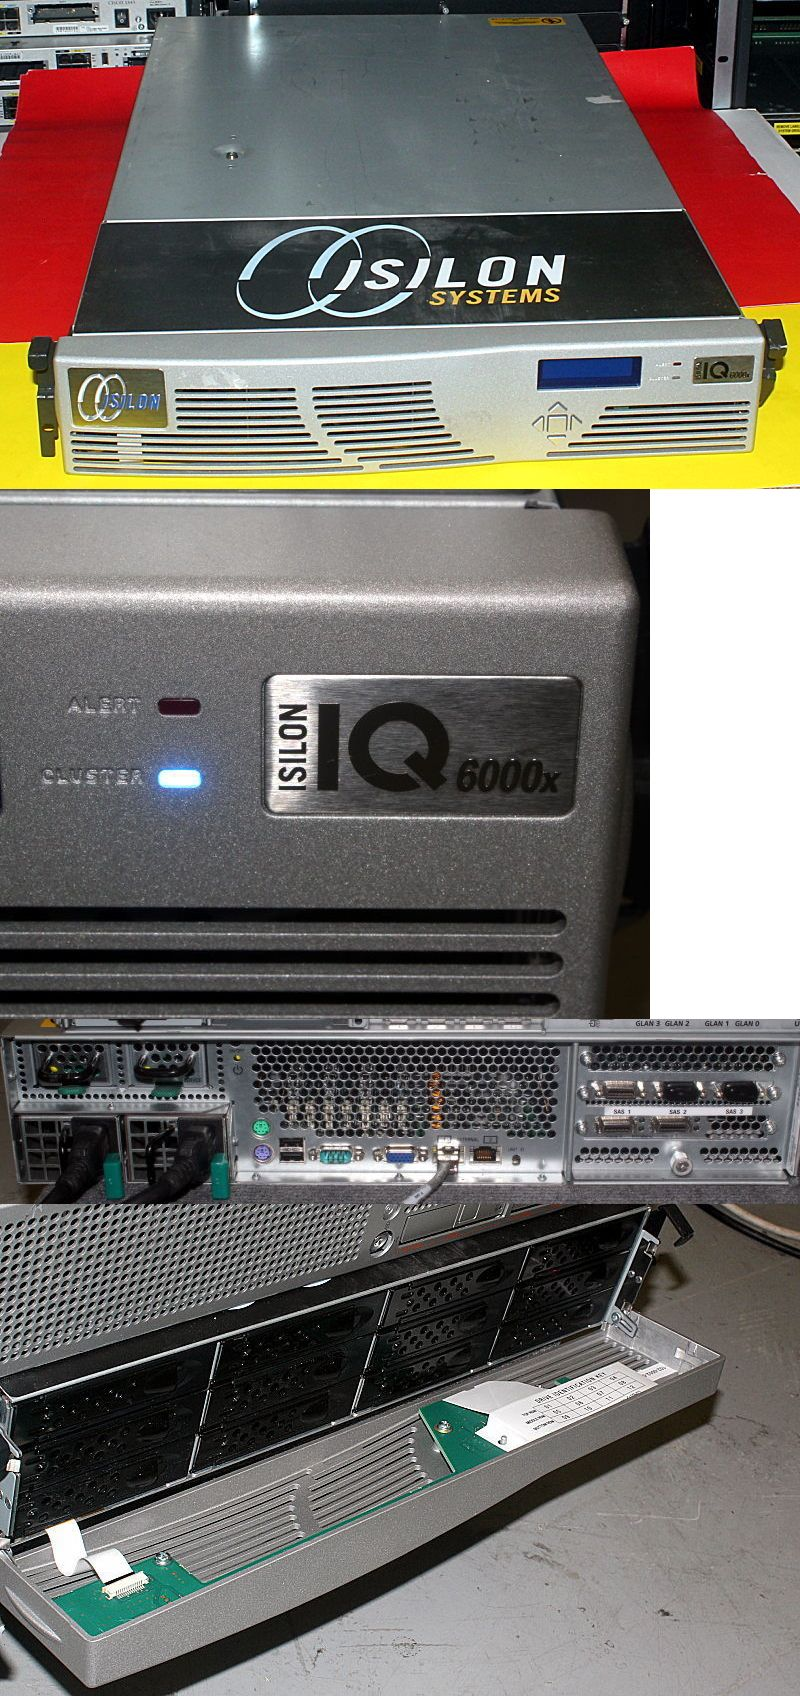 Nas Disk Arrays 64069 Emc Isilon Iq6000x Server 2 33ghz Quad Core 2gb Ram 6tb 12x 500gb Hdd Buy It Now Only 725 On Ebay Arrays Isilon Quad Hdd Server